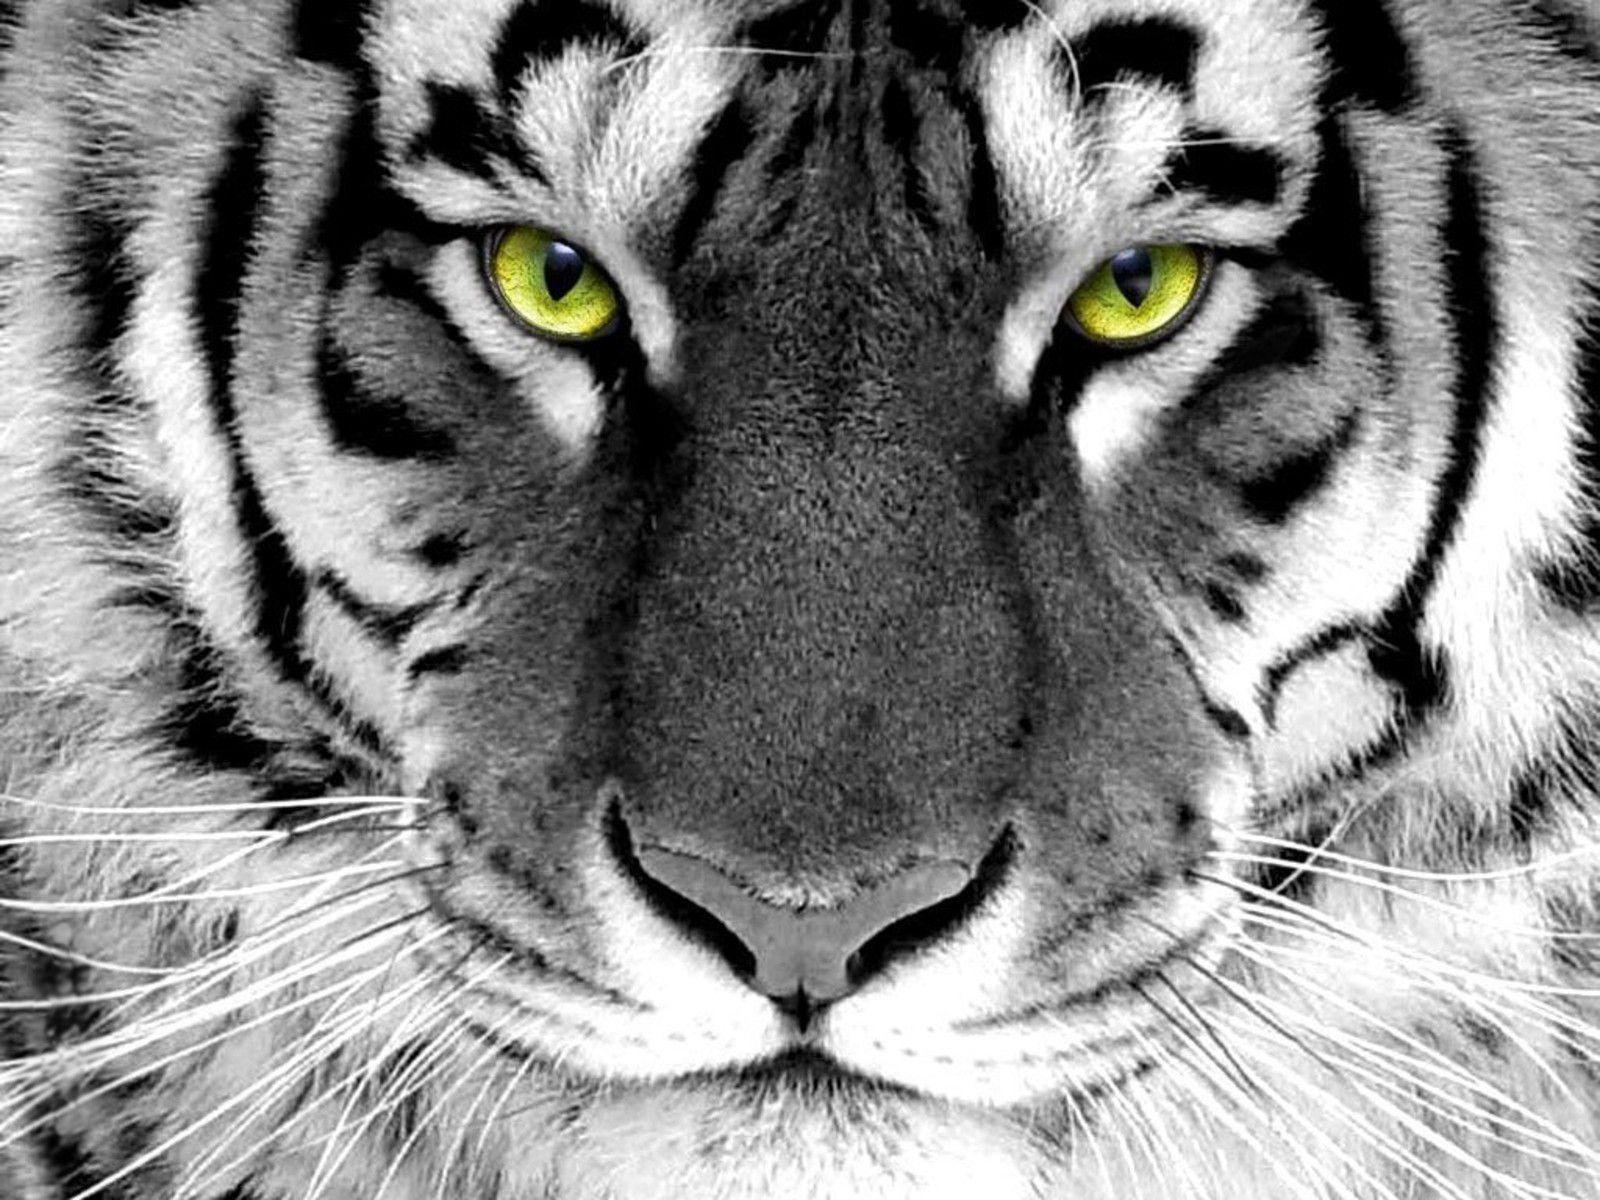 White Tiger Wallpaper Hd 1080p Tiger Hd Wallpapers Wallpaper Cave